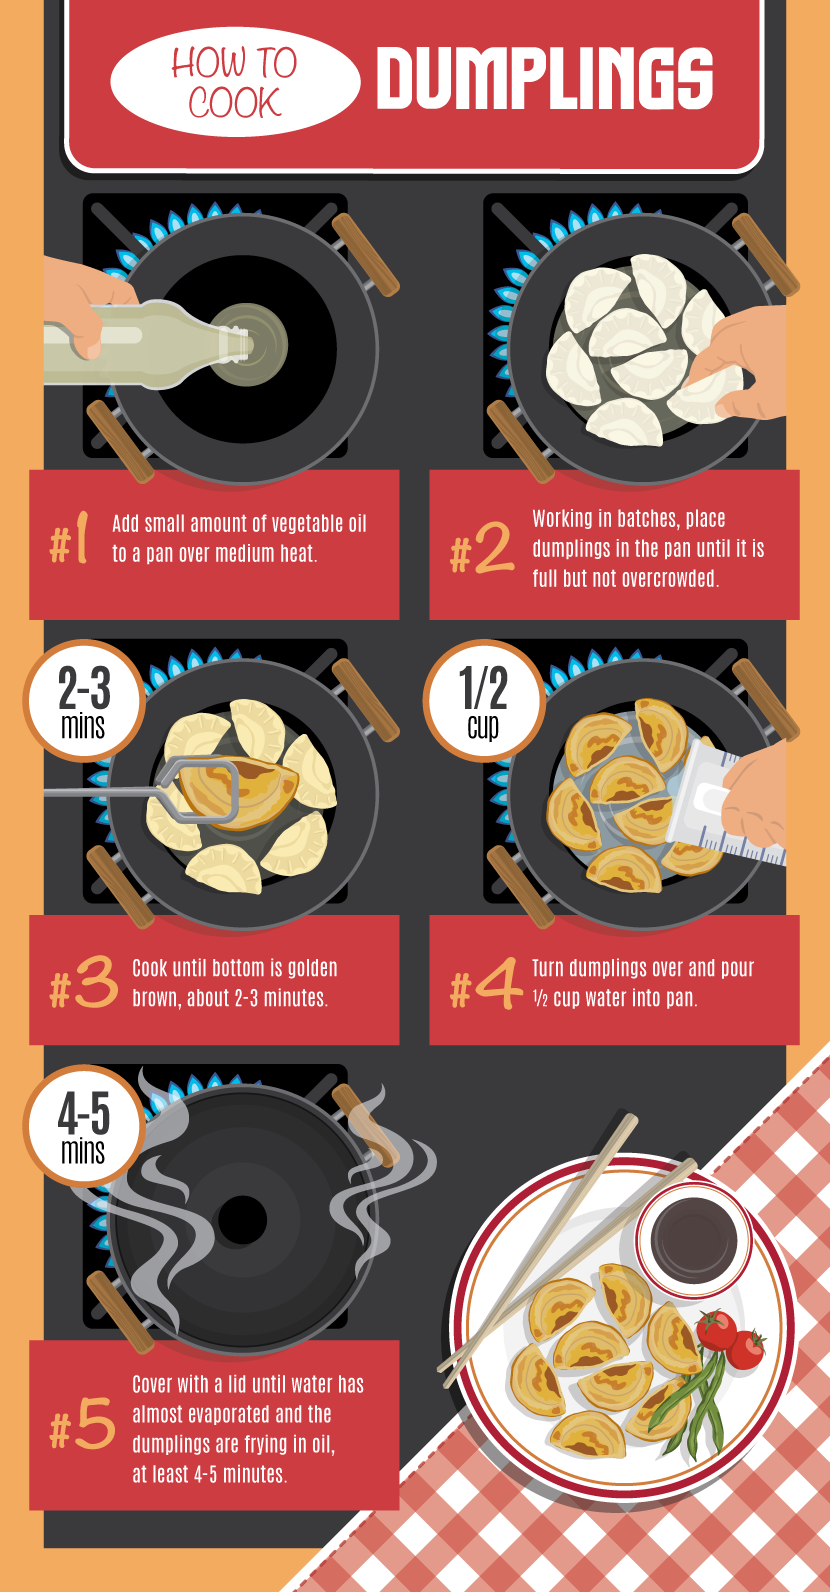 Cooking Dumplings - Making Your Own Dumplings